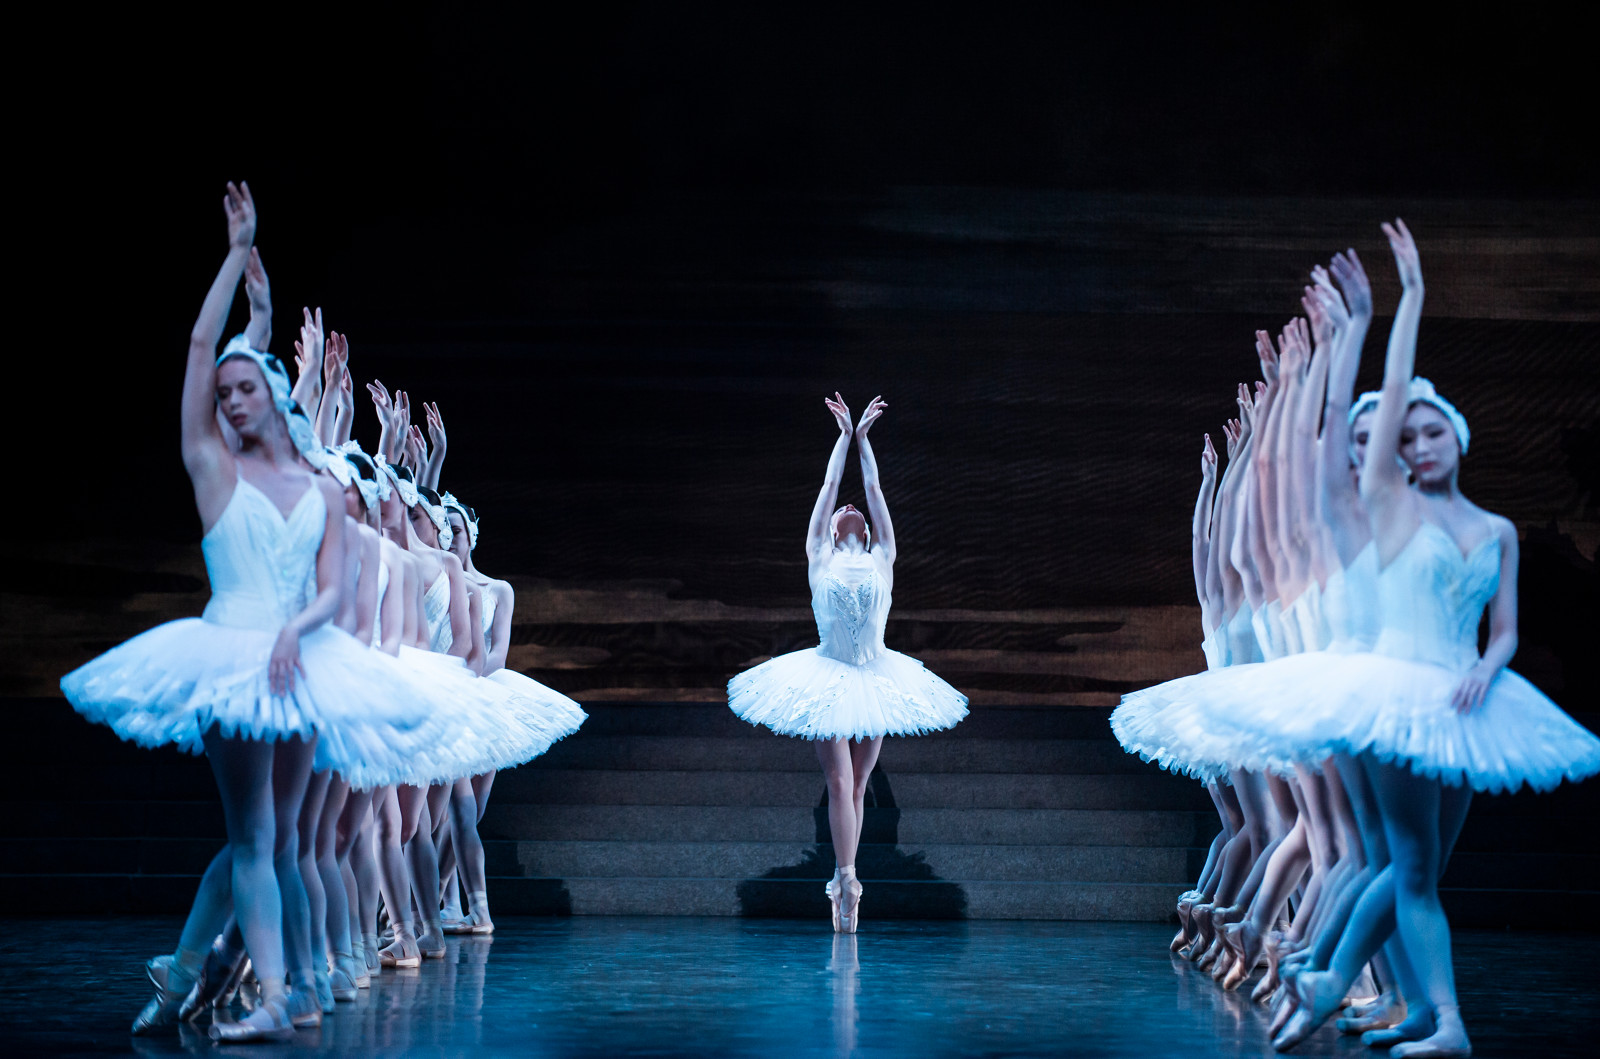 Léonore Baulac in Nureyev's Swan Lake. Paris Opera Ballet. Photo by Julien Benhamou.